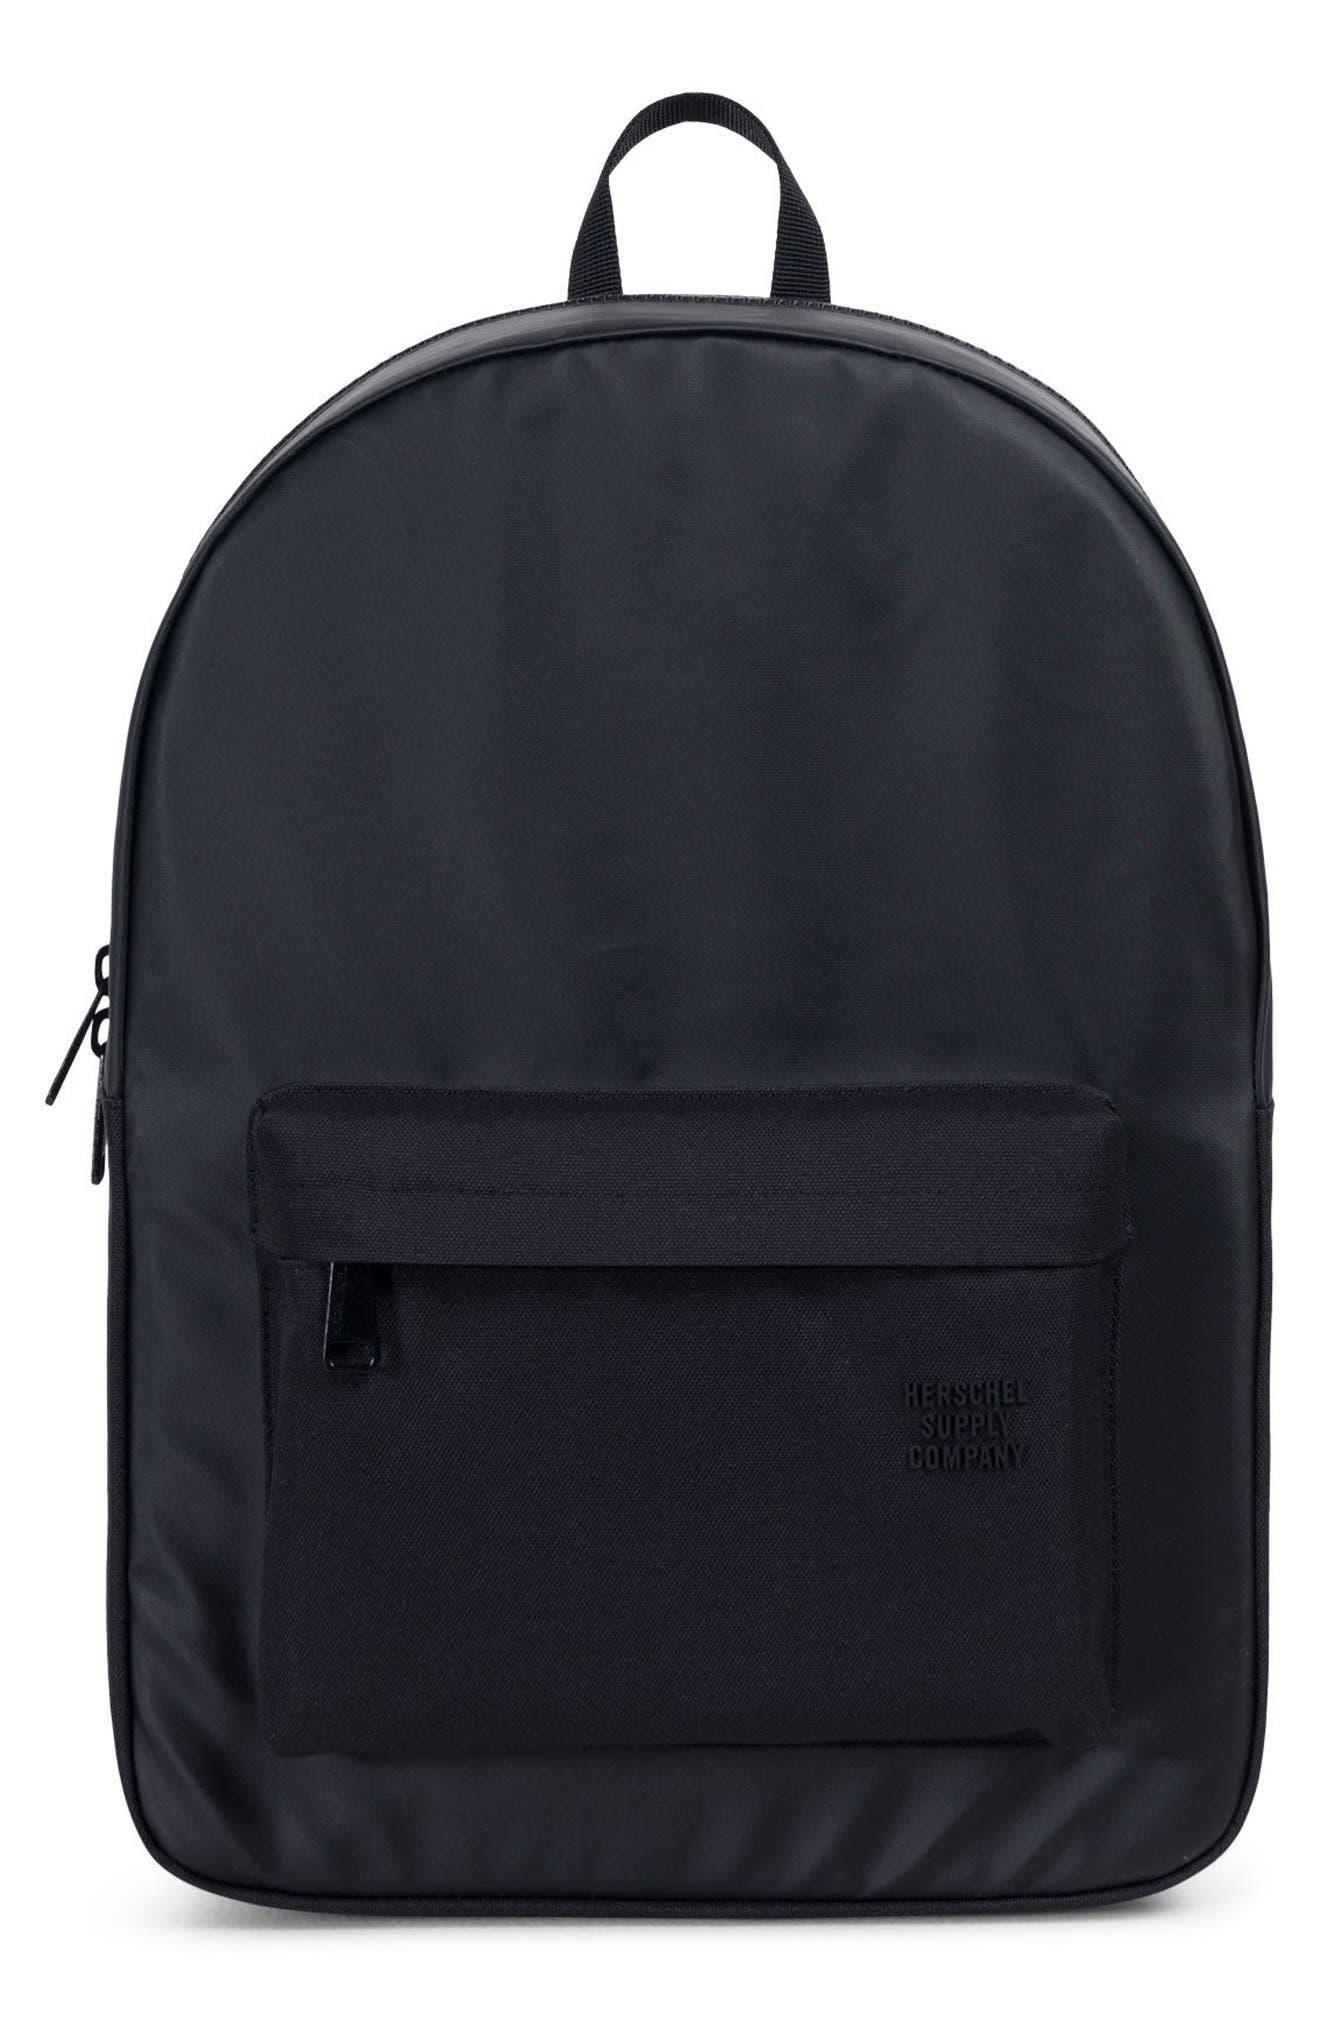 Winlaw Polycoat Studio Backpack,                             Main thumbnail 1, color,                             Black